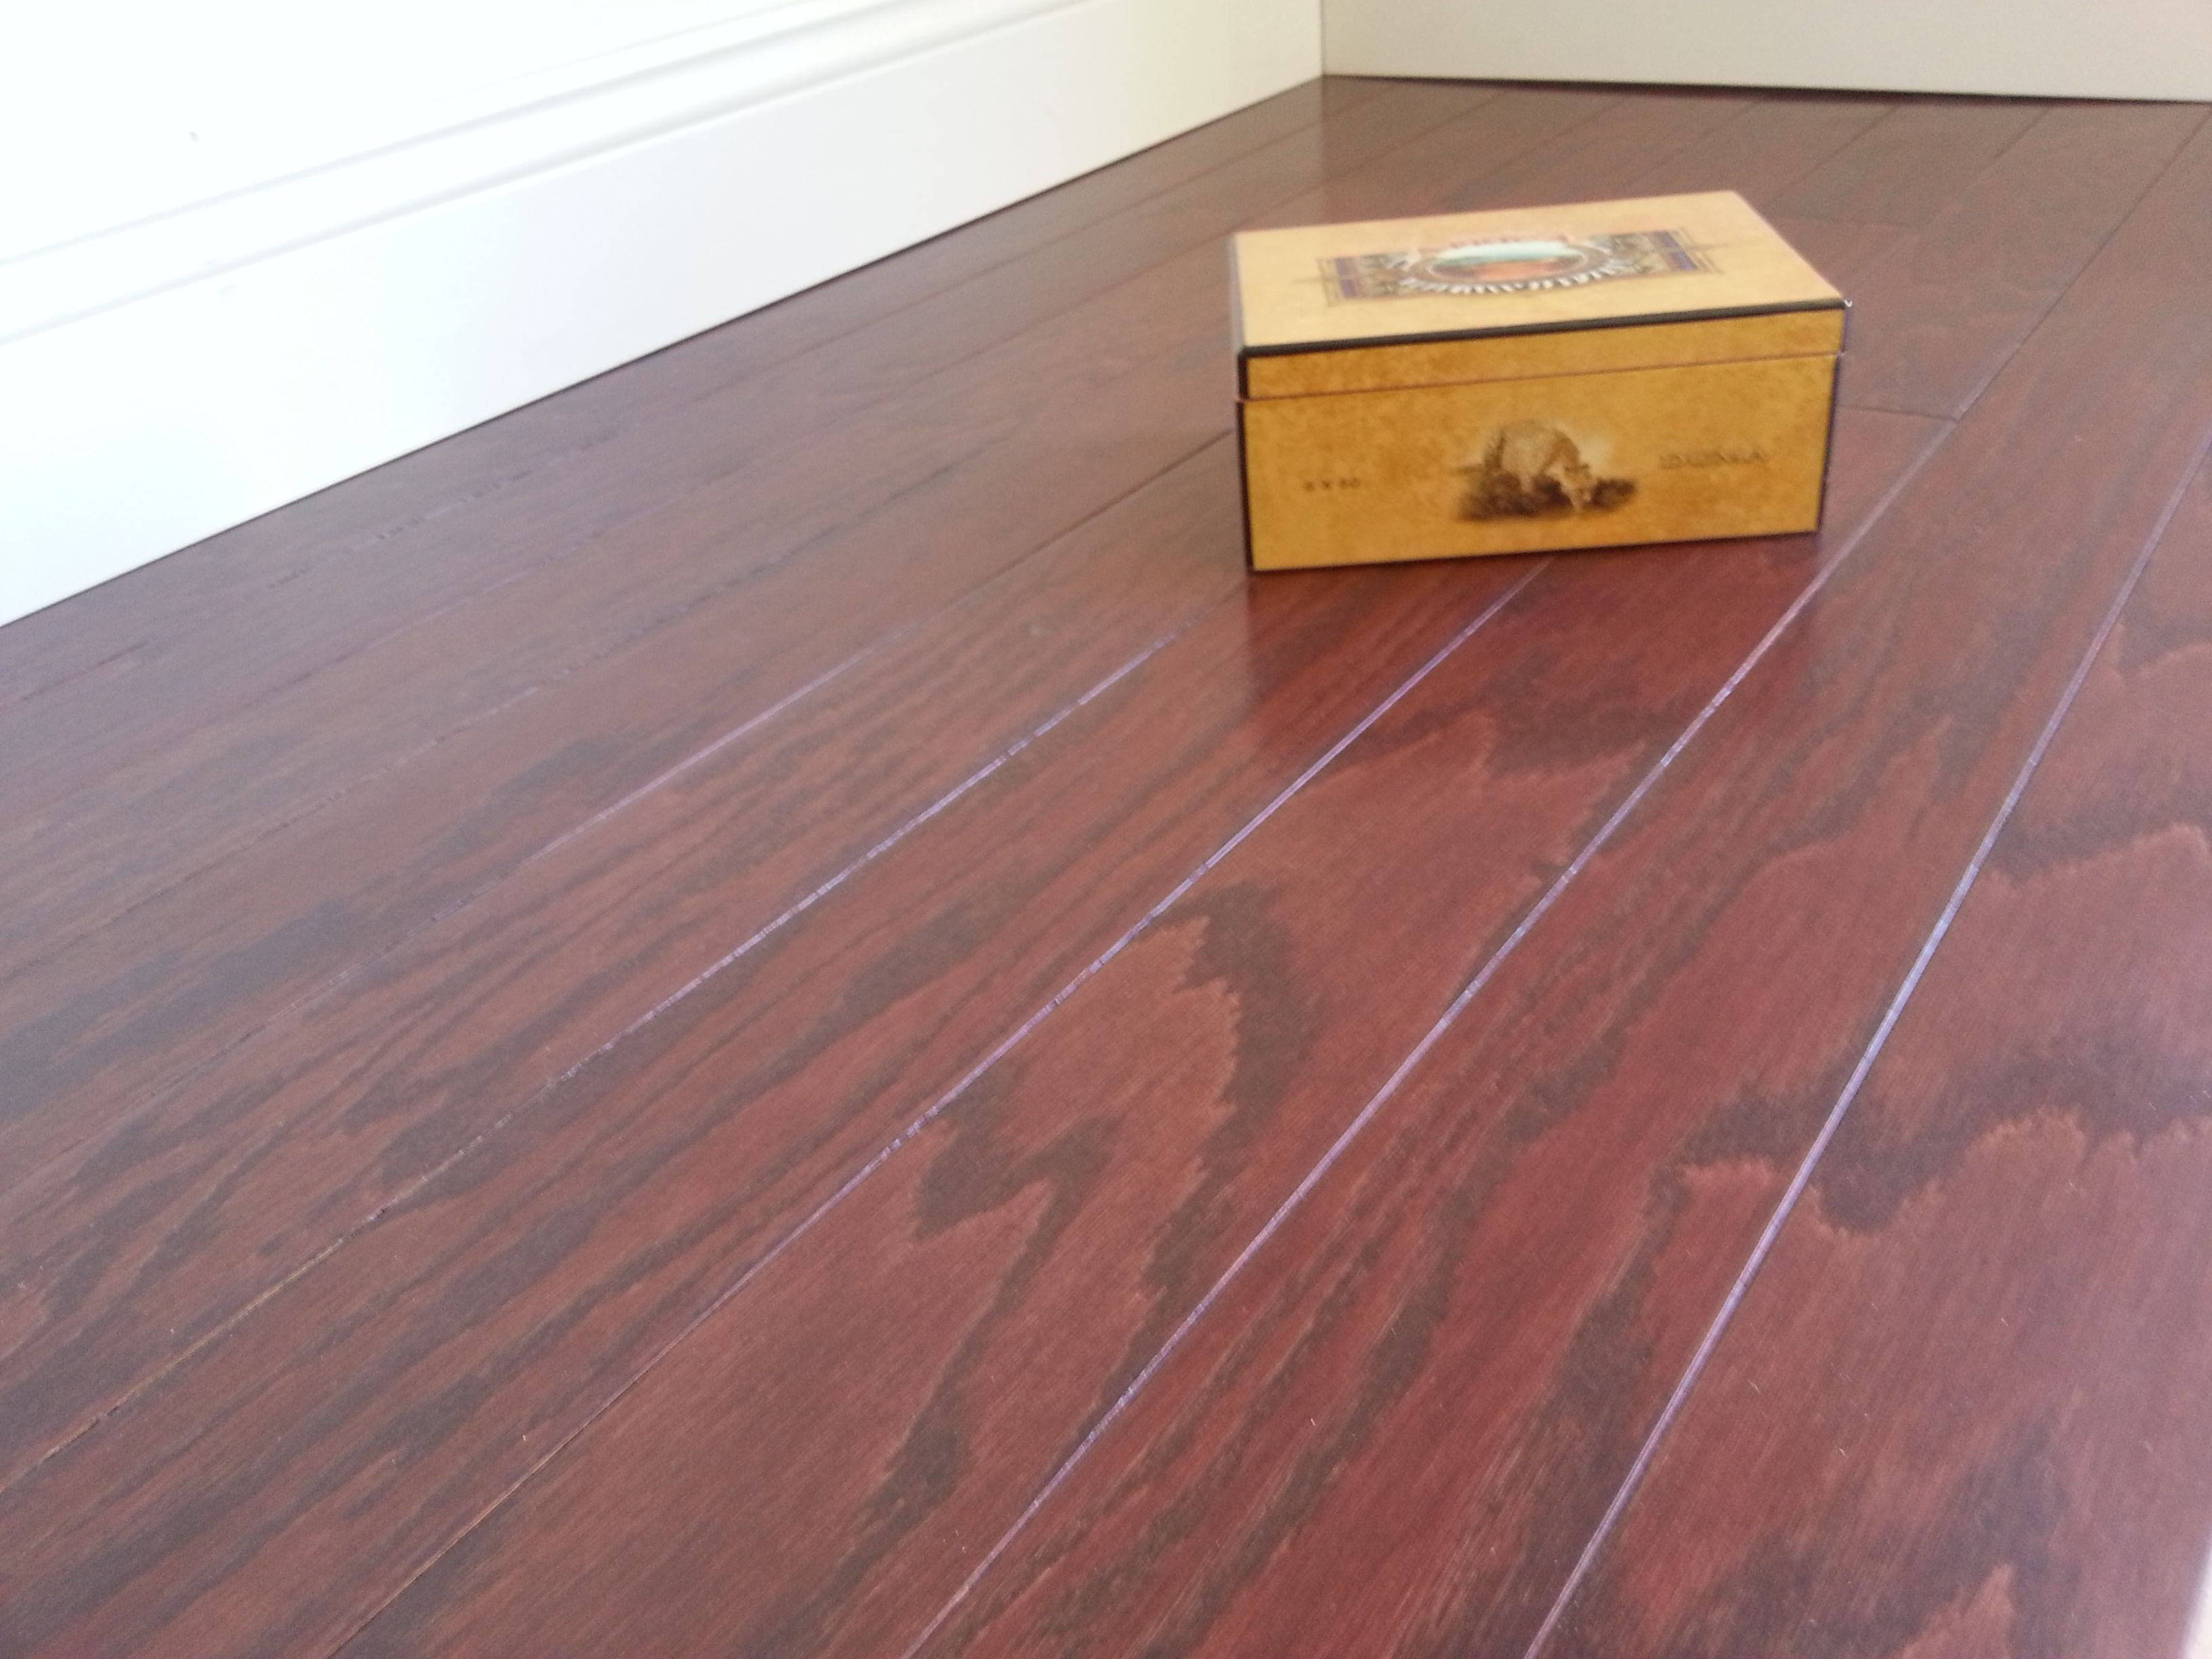 hardwood flooring cornelius nc of 3 1 4 symphonic engineered oak merlot hardwood flooring as low as inside 3 1 4 symphonic engineered oak merlot hardwood flooring as low as 3 23 sf